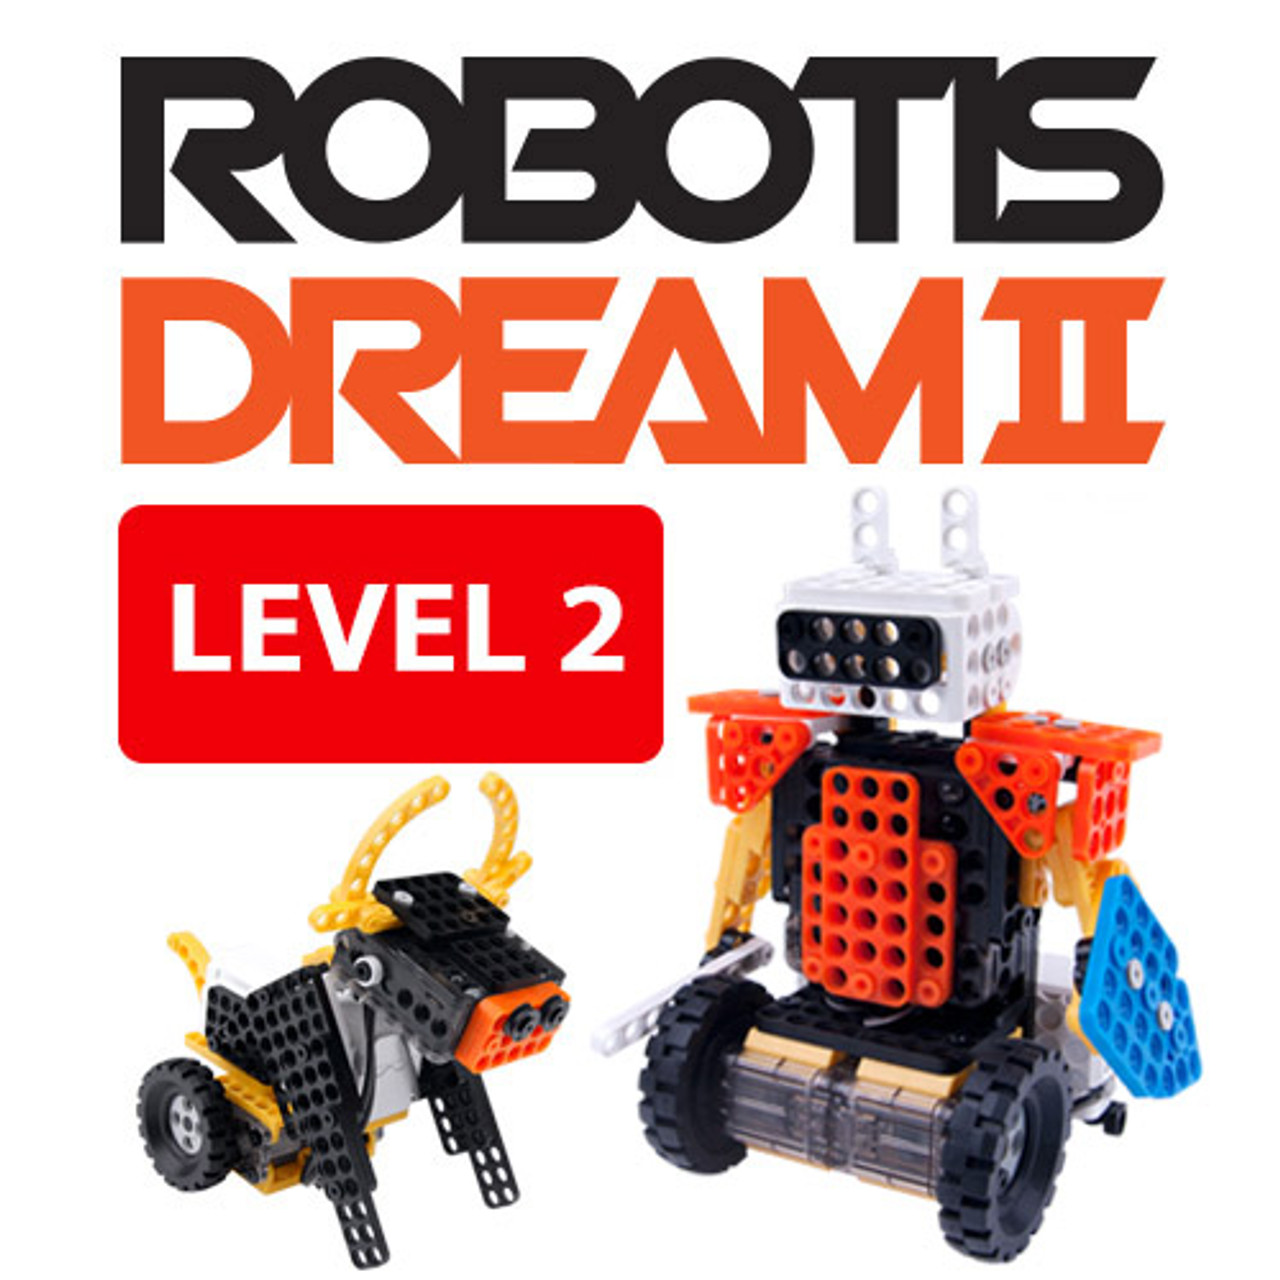 DREAM II Level 2